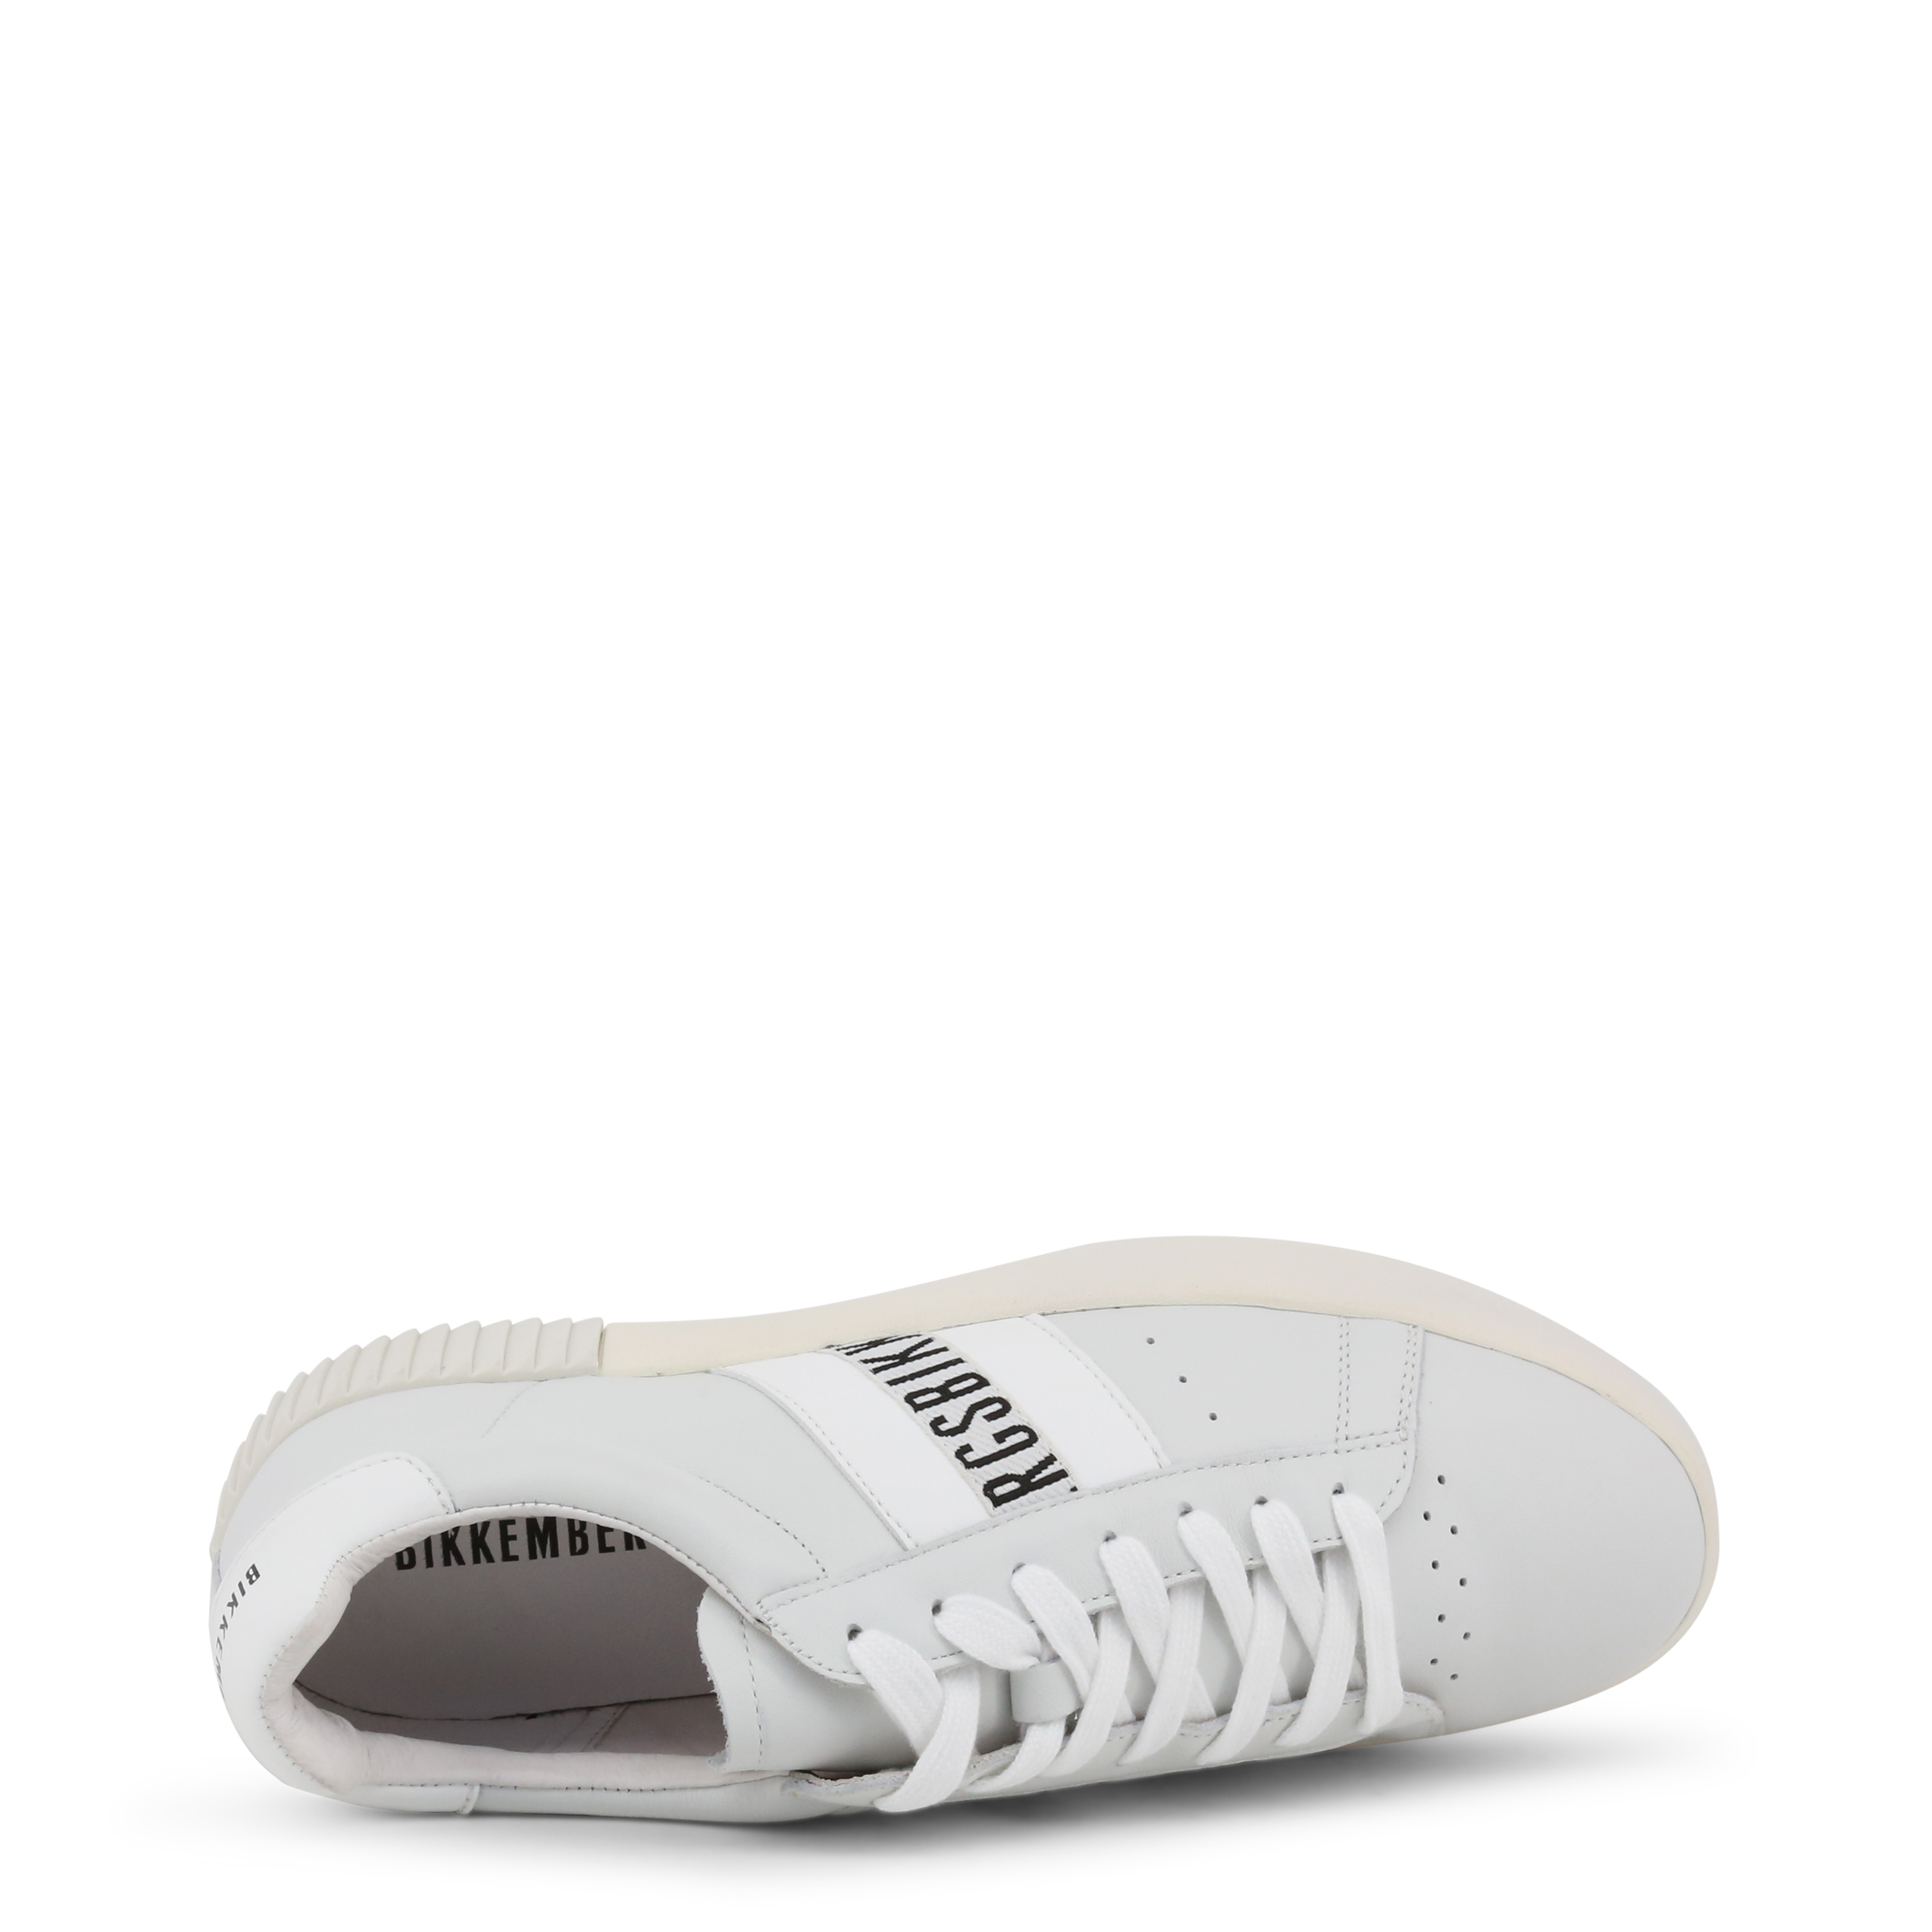 Sneakers-Bikkembergs-COSMOS-2434-Uomo-Bianco-98819 miniatura 3